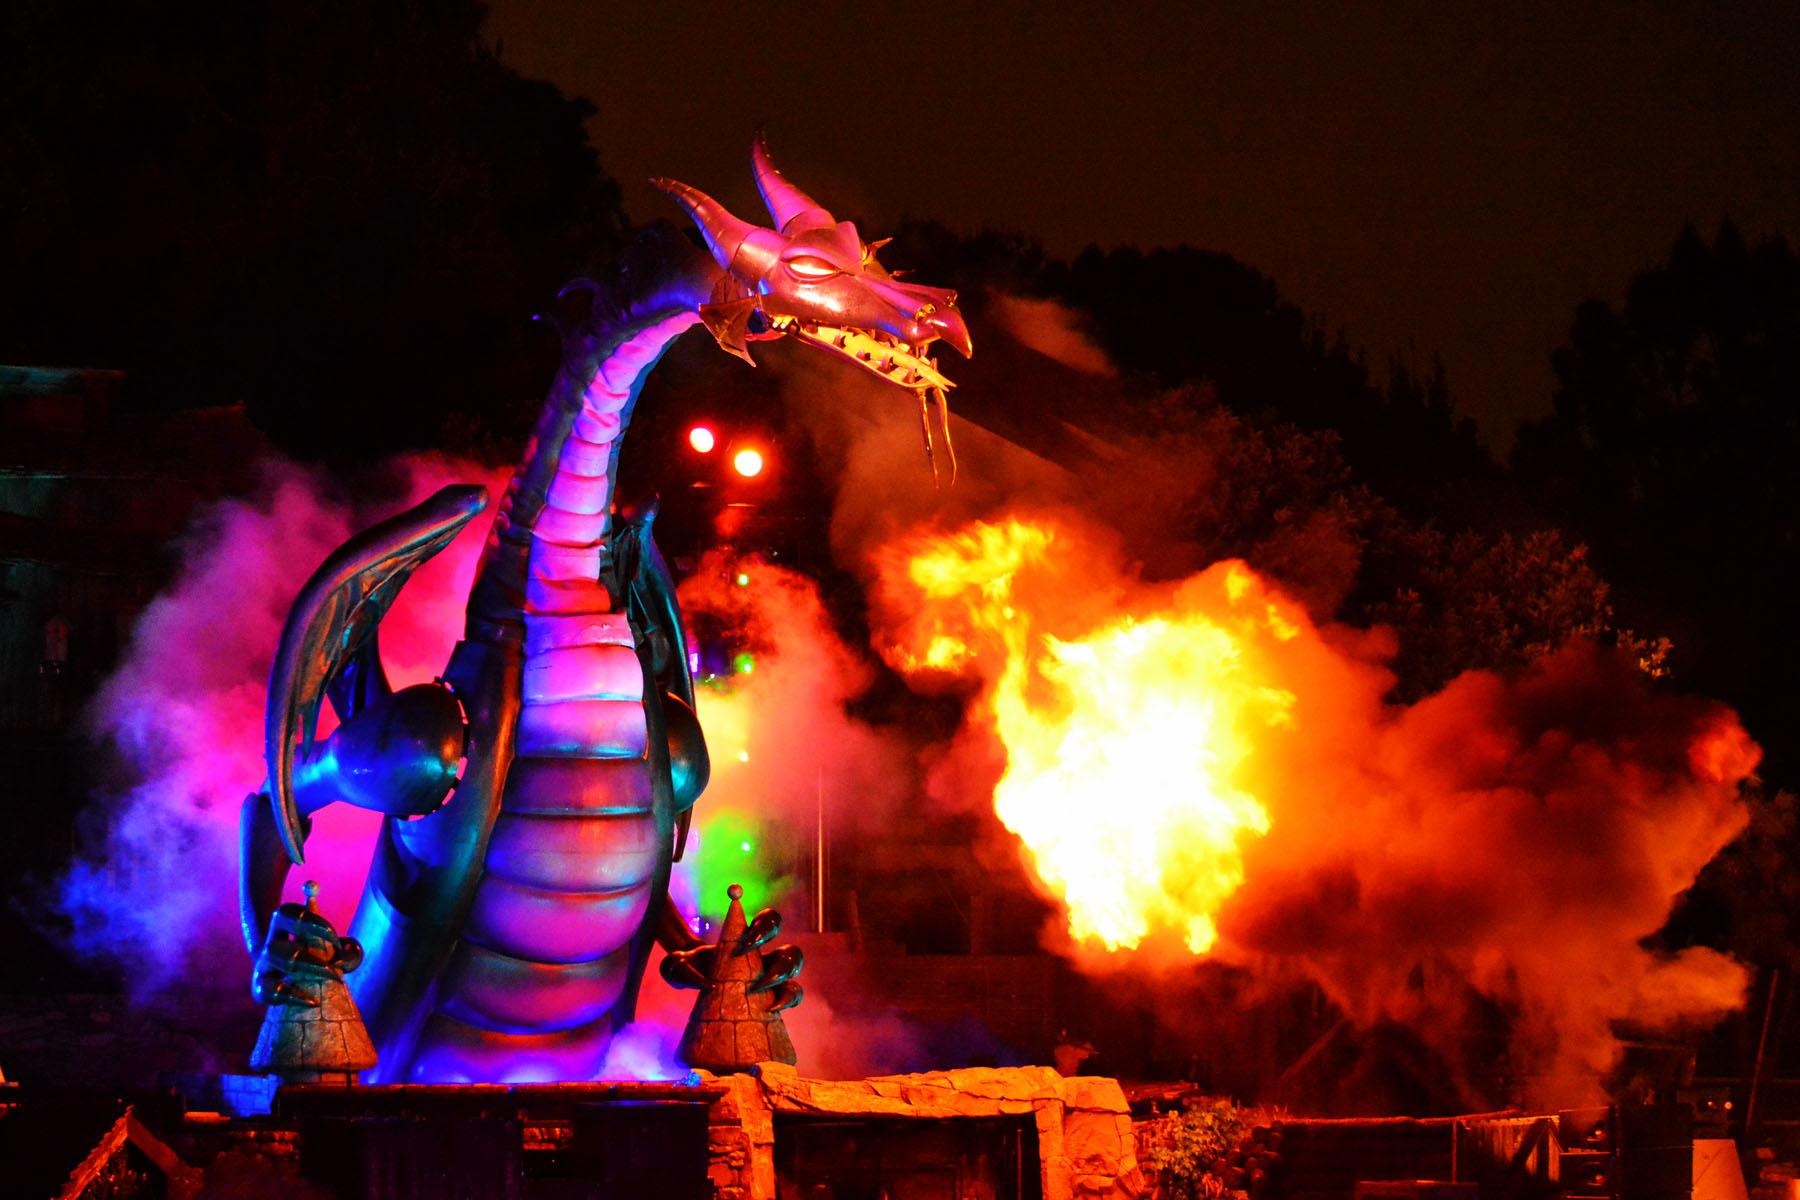 Fantasmic! Disneyland Resort